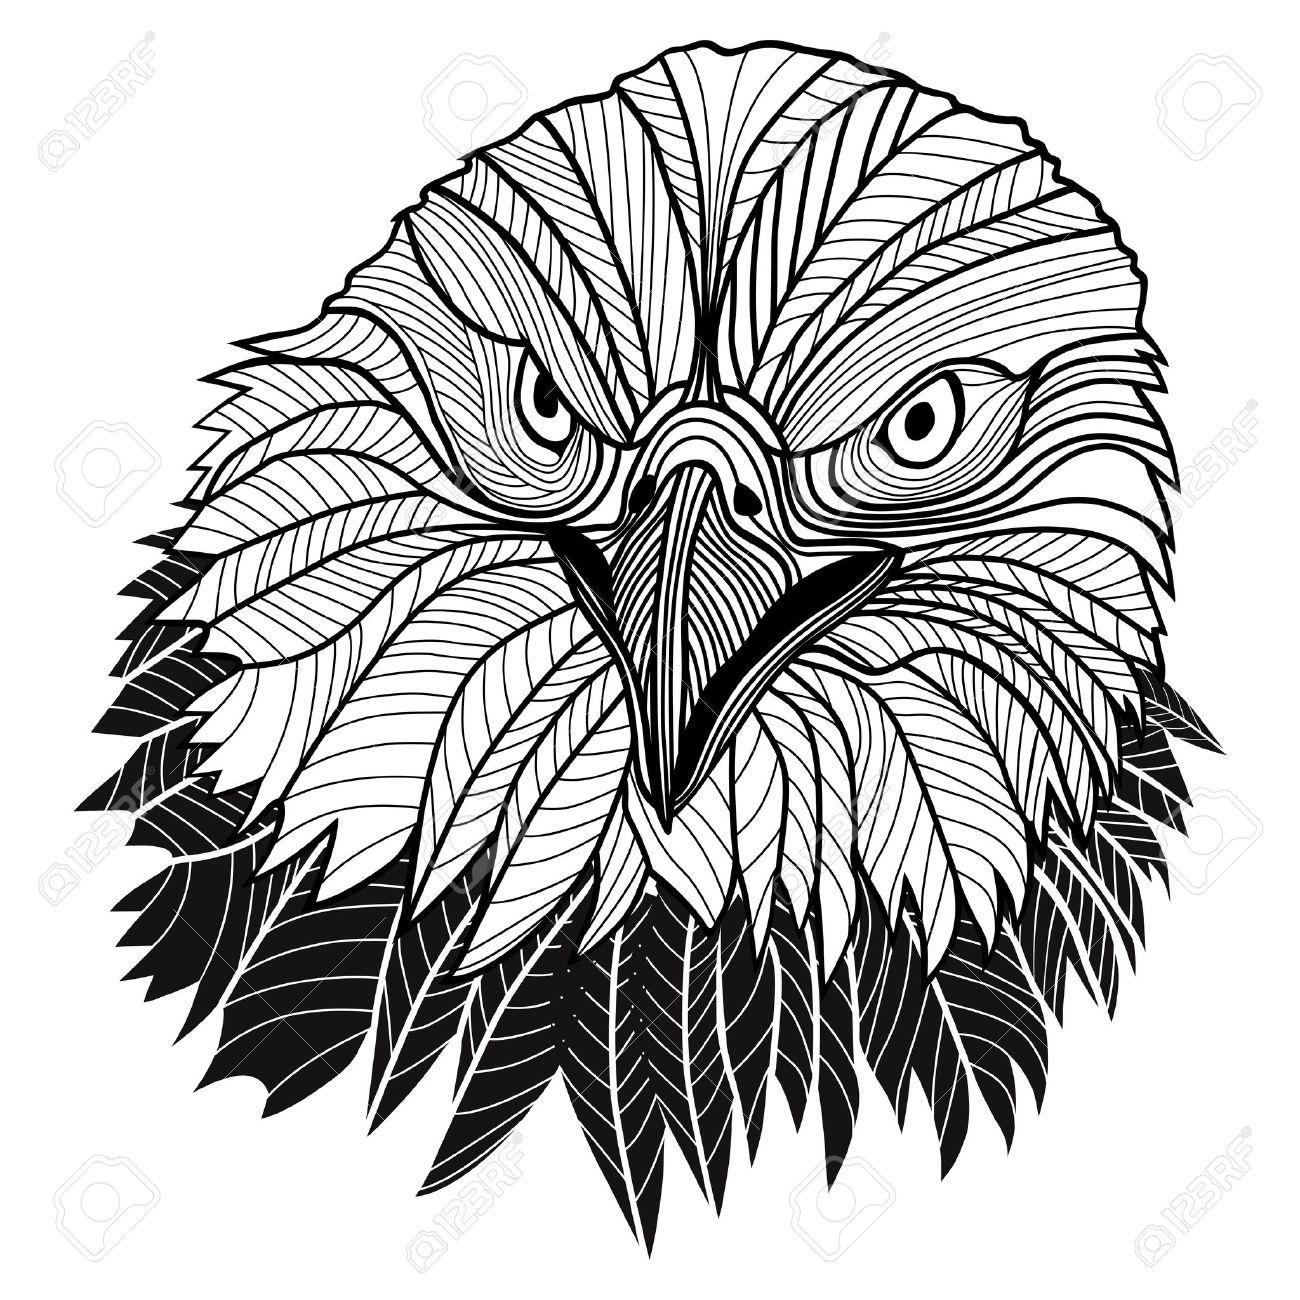 Design t shirt logo free - Bird Bald Eagle Head As Usa Symbol For Mascot Or Emblem Design Logo Vector Illustration